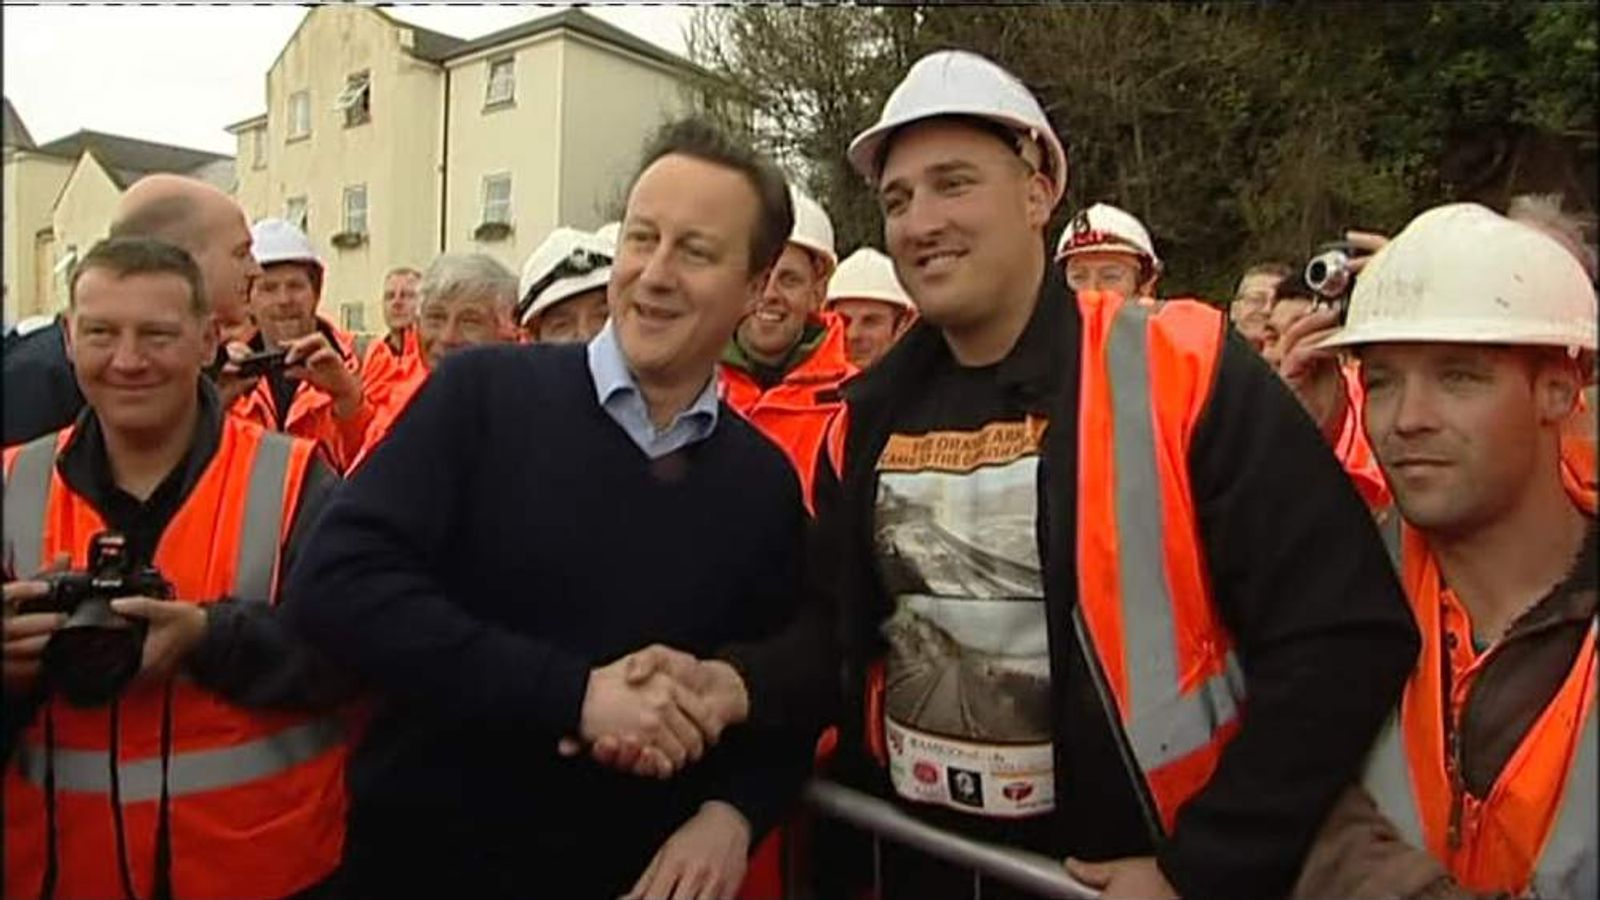 David Cameron thanks rail workers in Dawlish